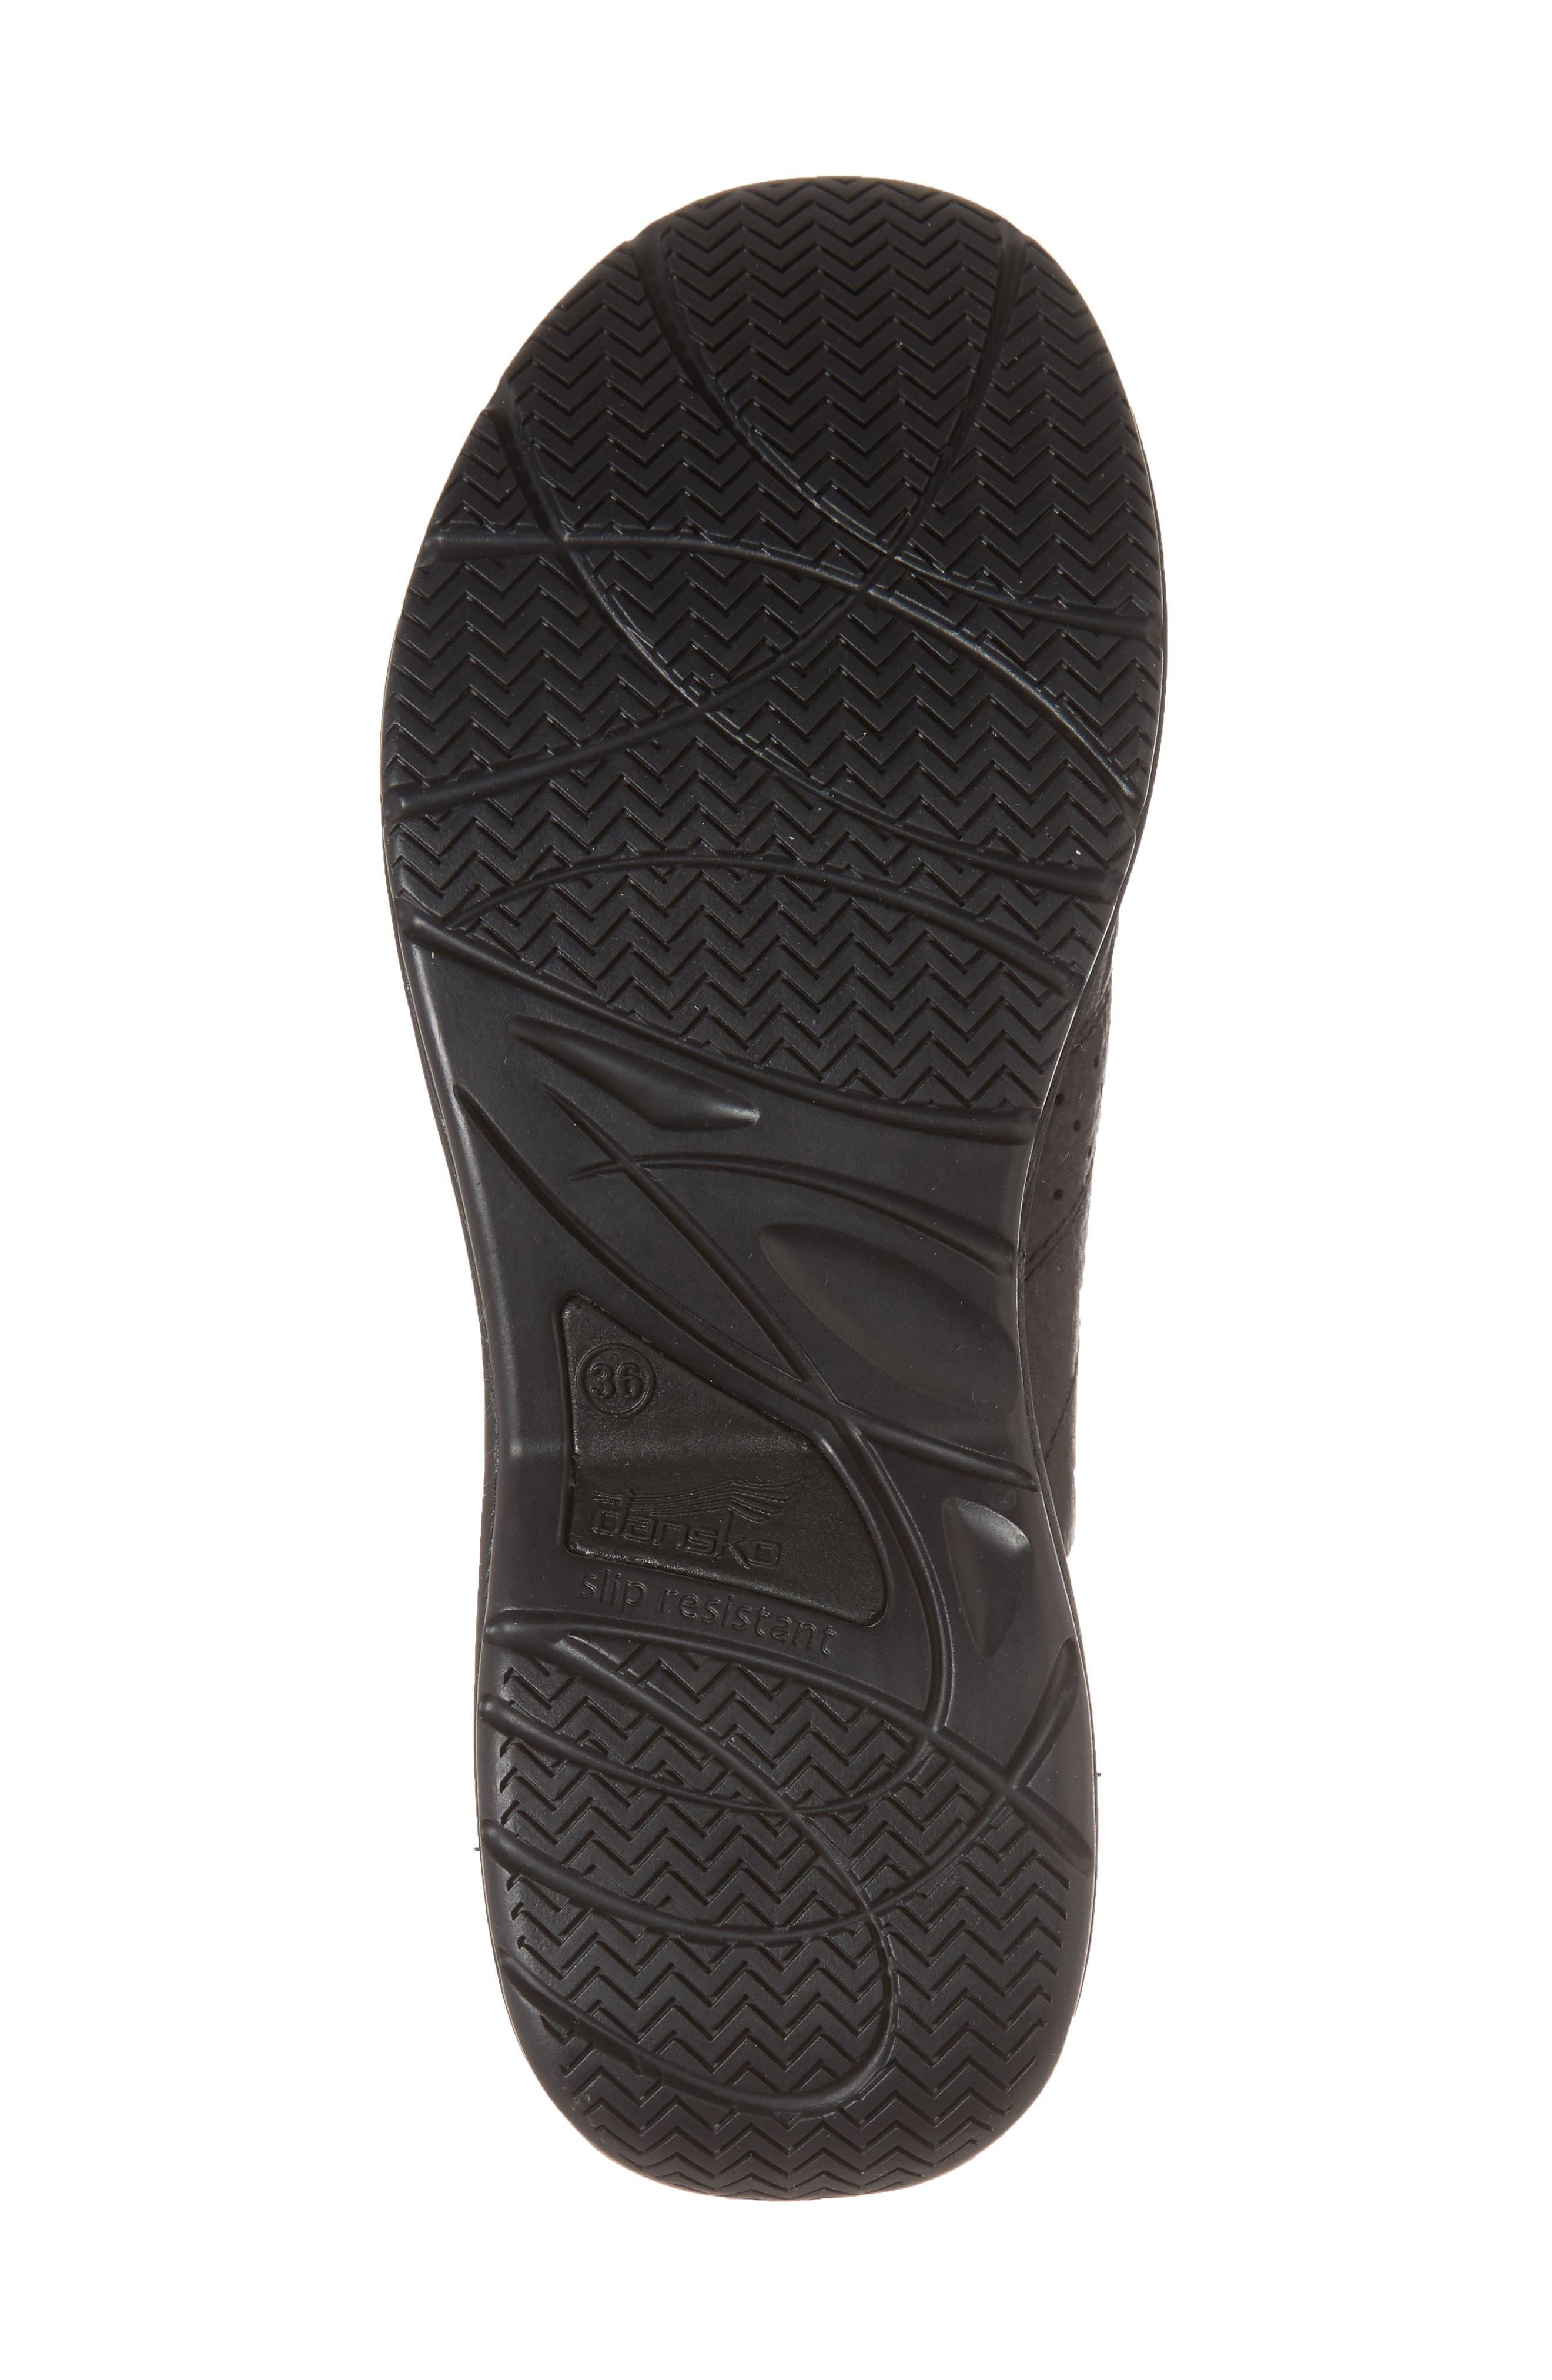 Dankso Shelly Mule,                             Alternate thumbnail 6, color,                             Black Leather